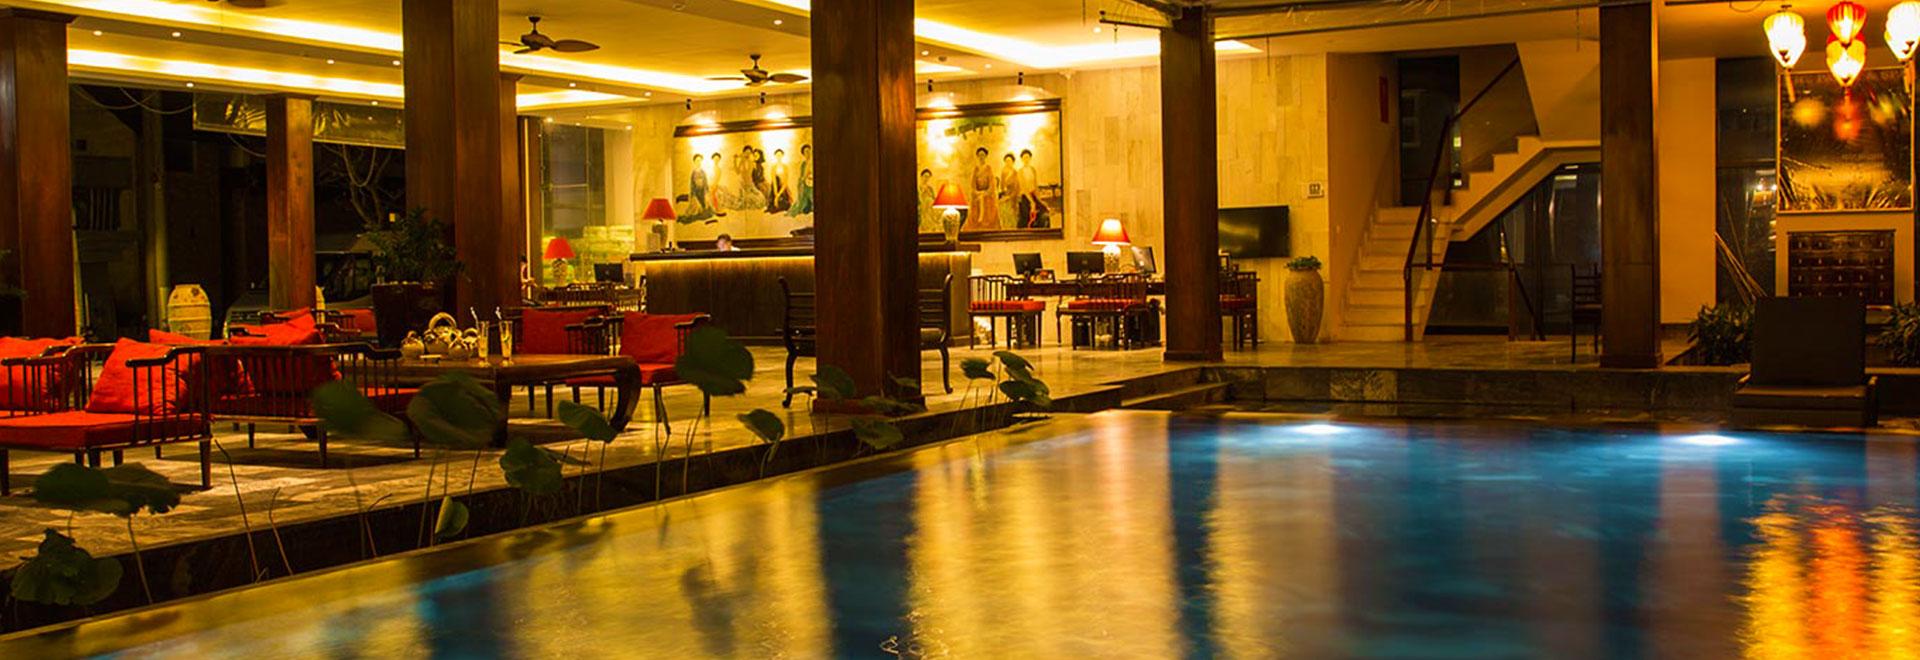 the-palmy-phu-quoc-resort-7.jpg